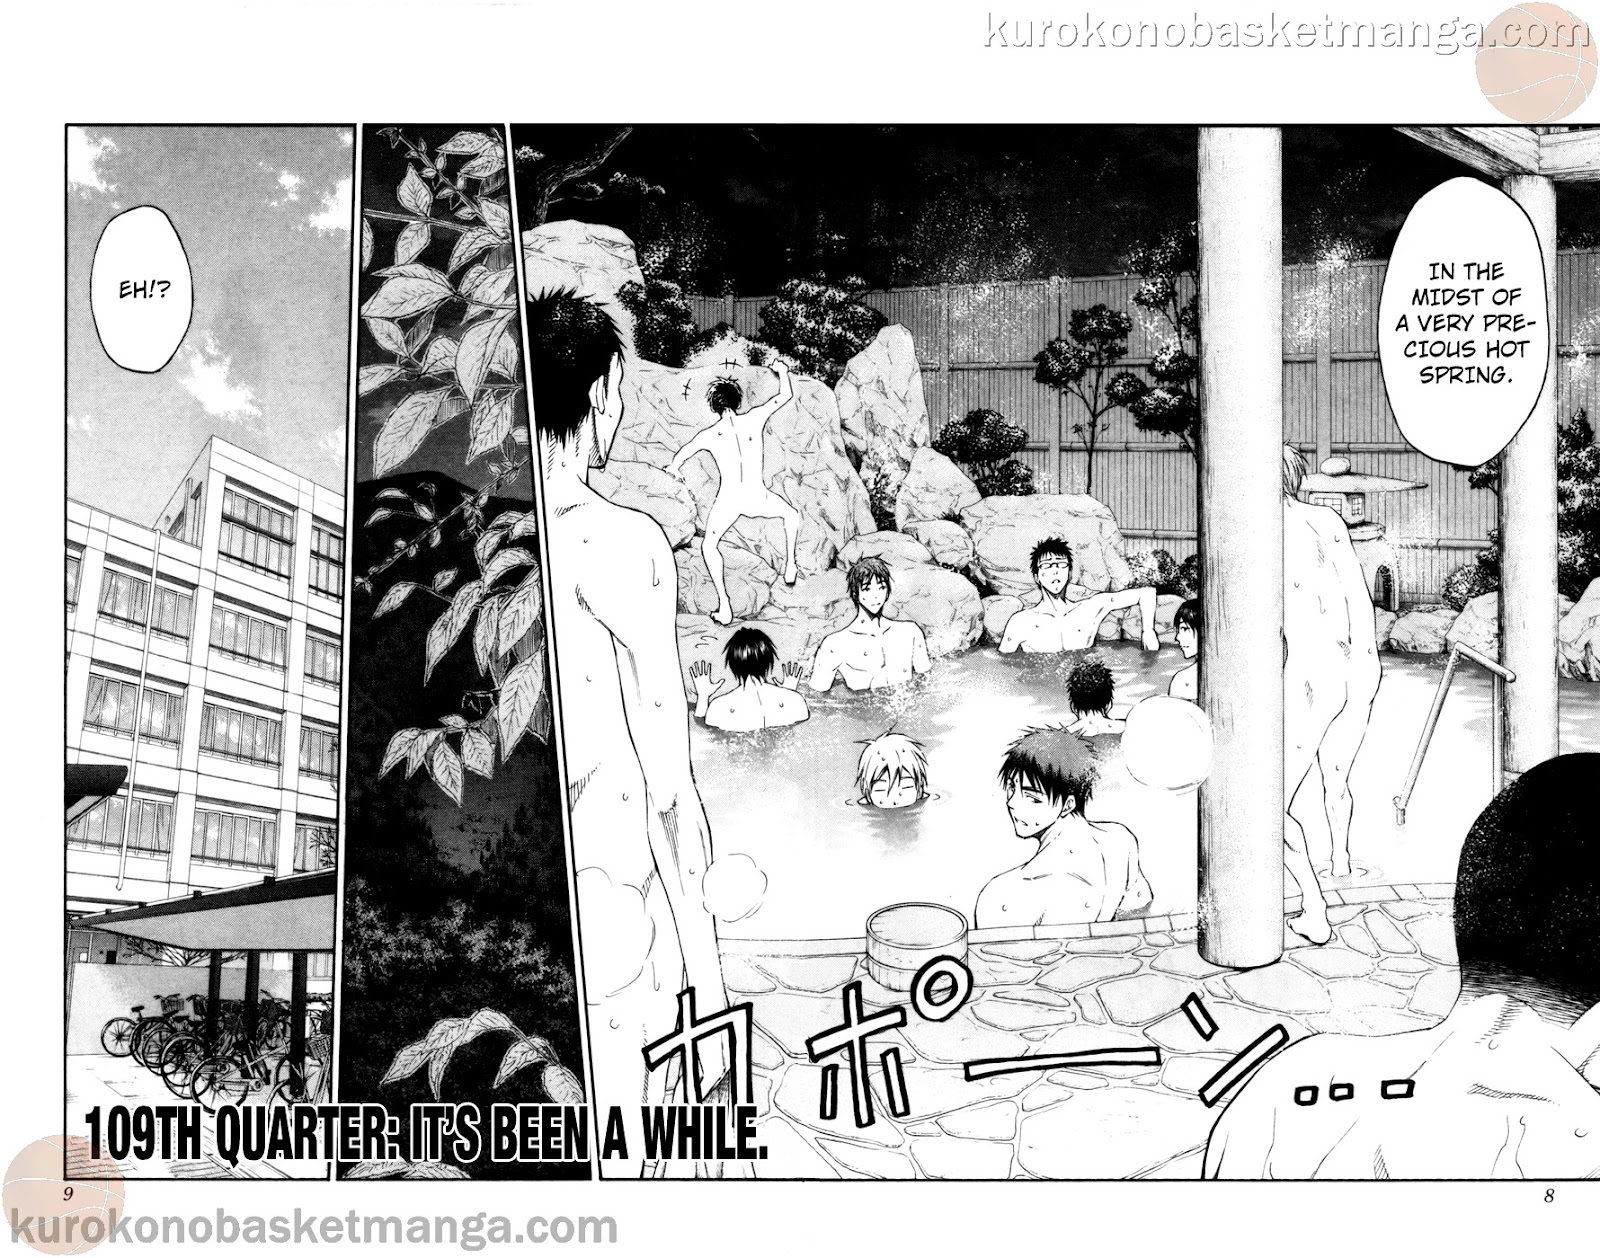 Kuroko no Basket Manga Chapter 109 - Image 06-07